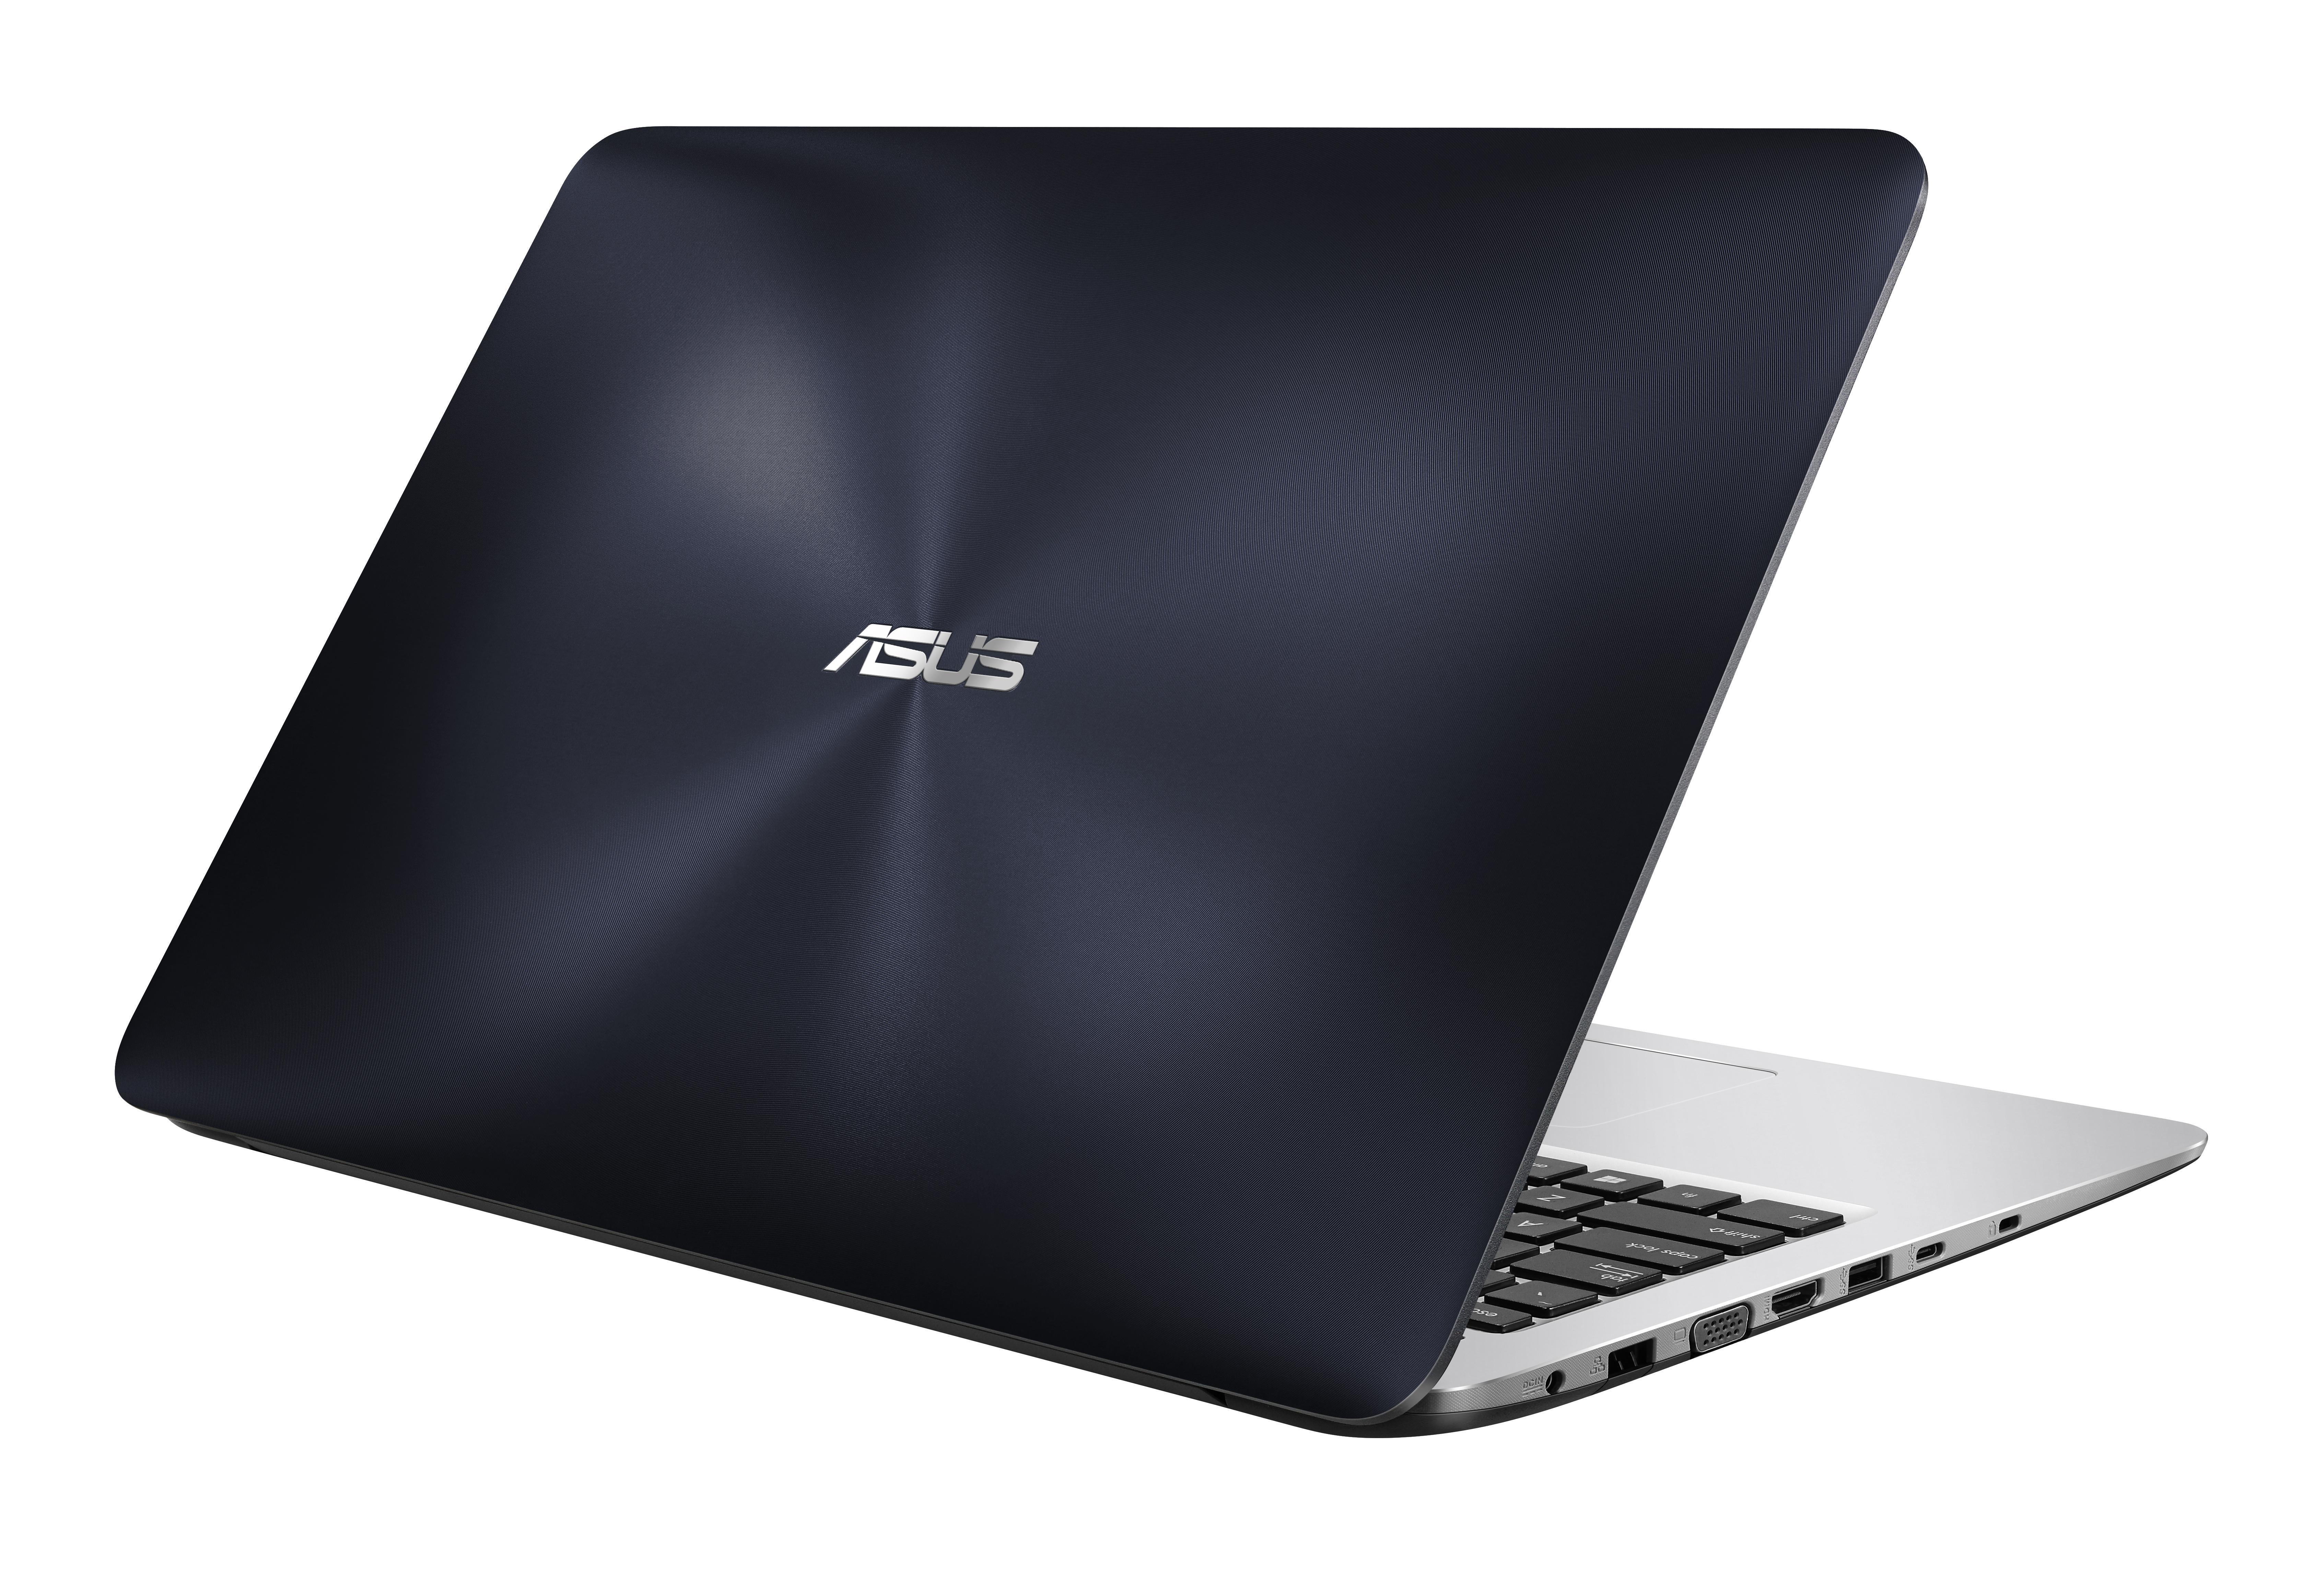 "ASUS A556UF-XX062D 2.3GHz i5-6200U 15.6"" 1366 x 768Pixel Blu, Acciaio inossidabile Computer portatile notebook/portatile"